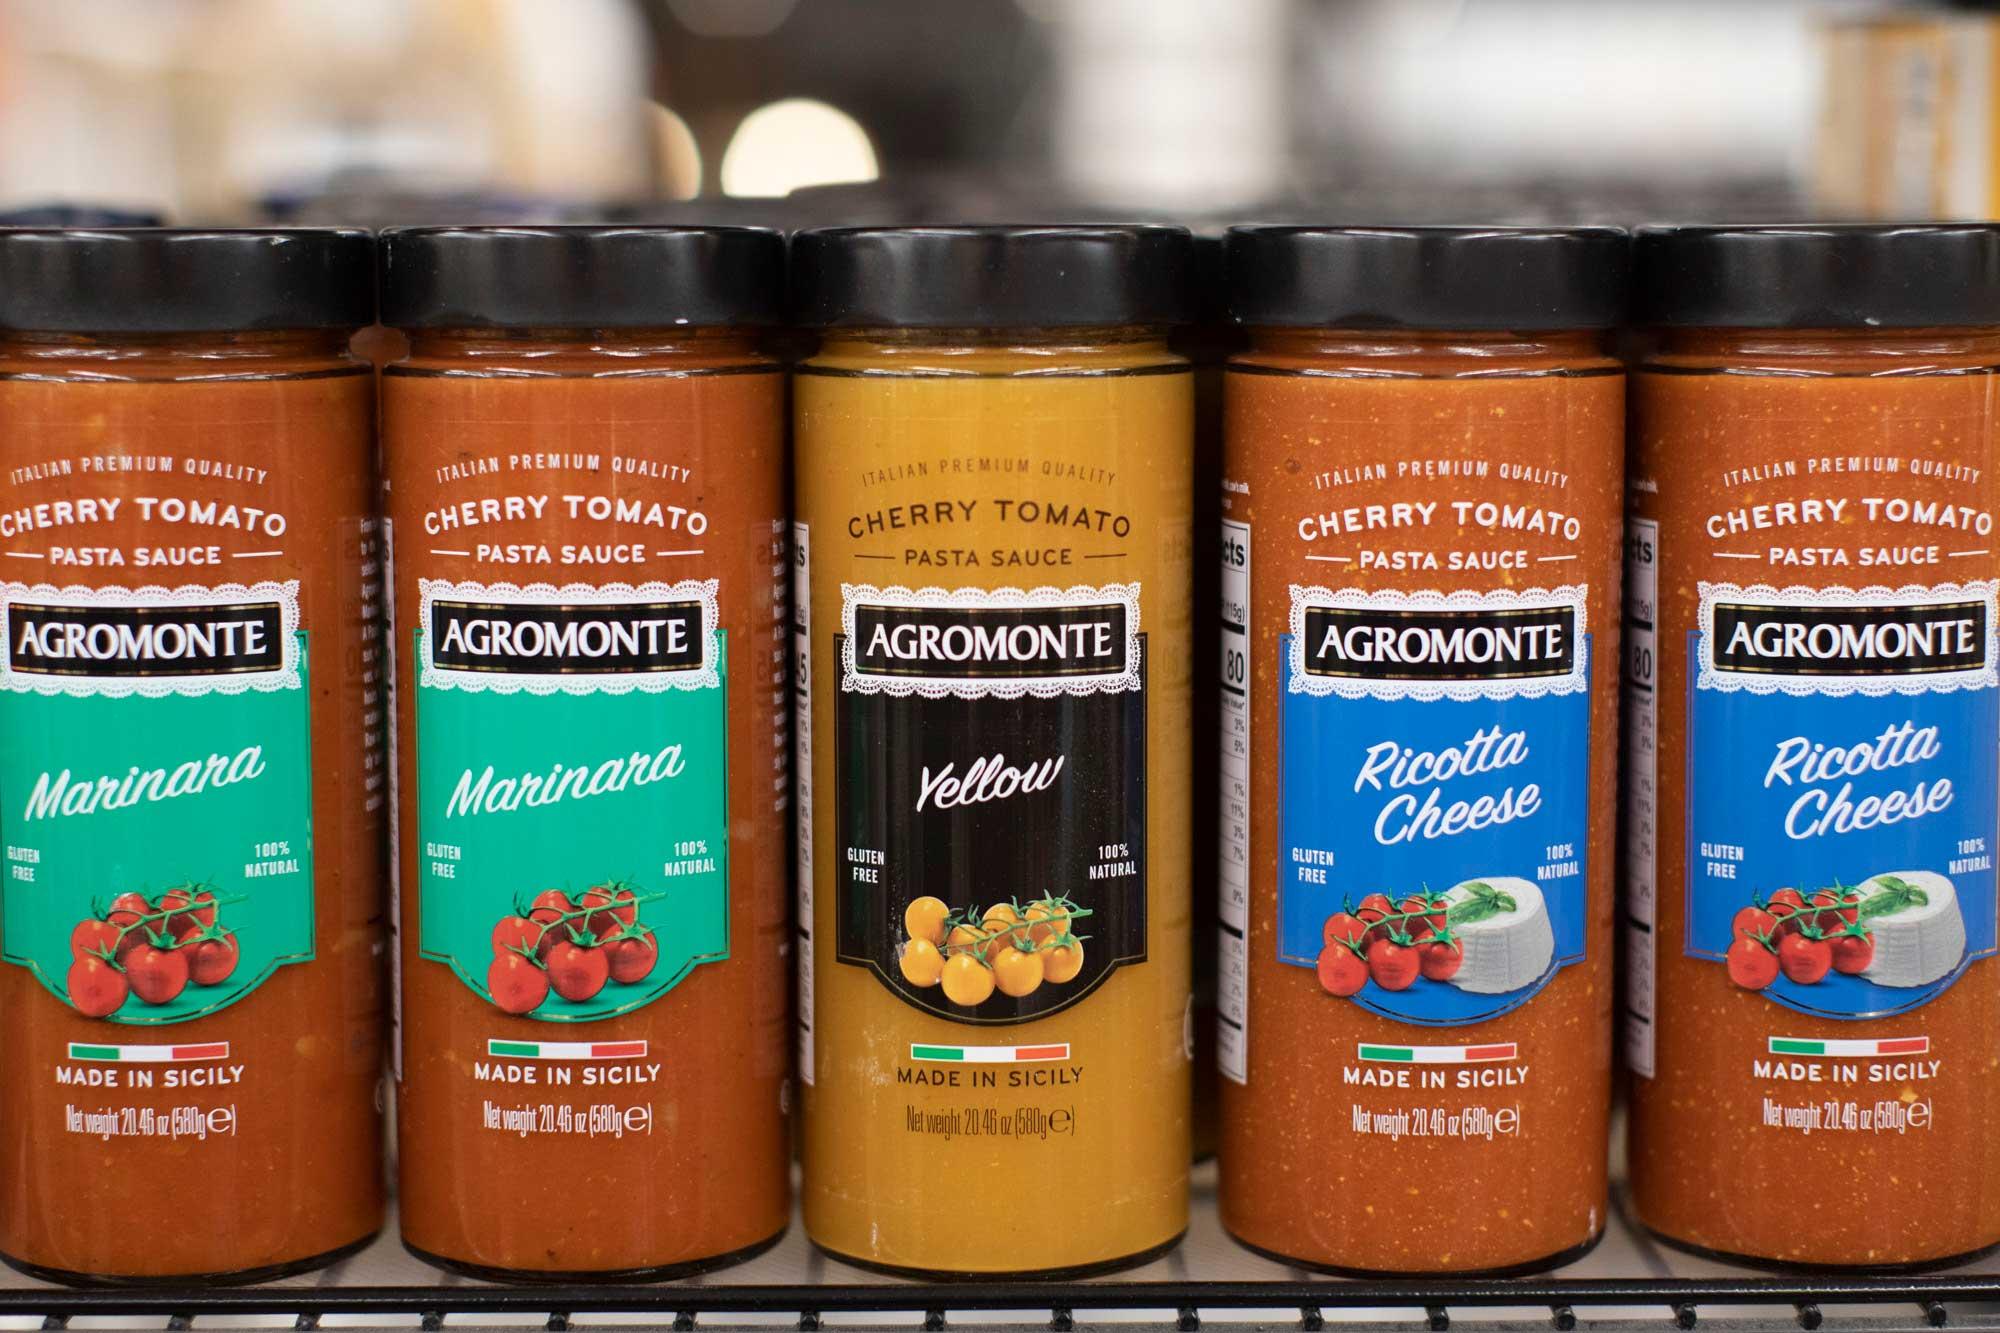 Agromonte Sauces on a shelf